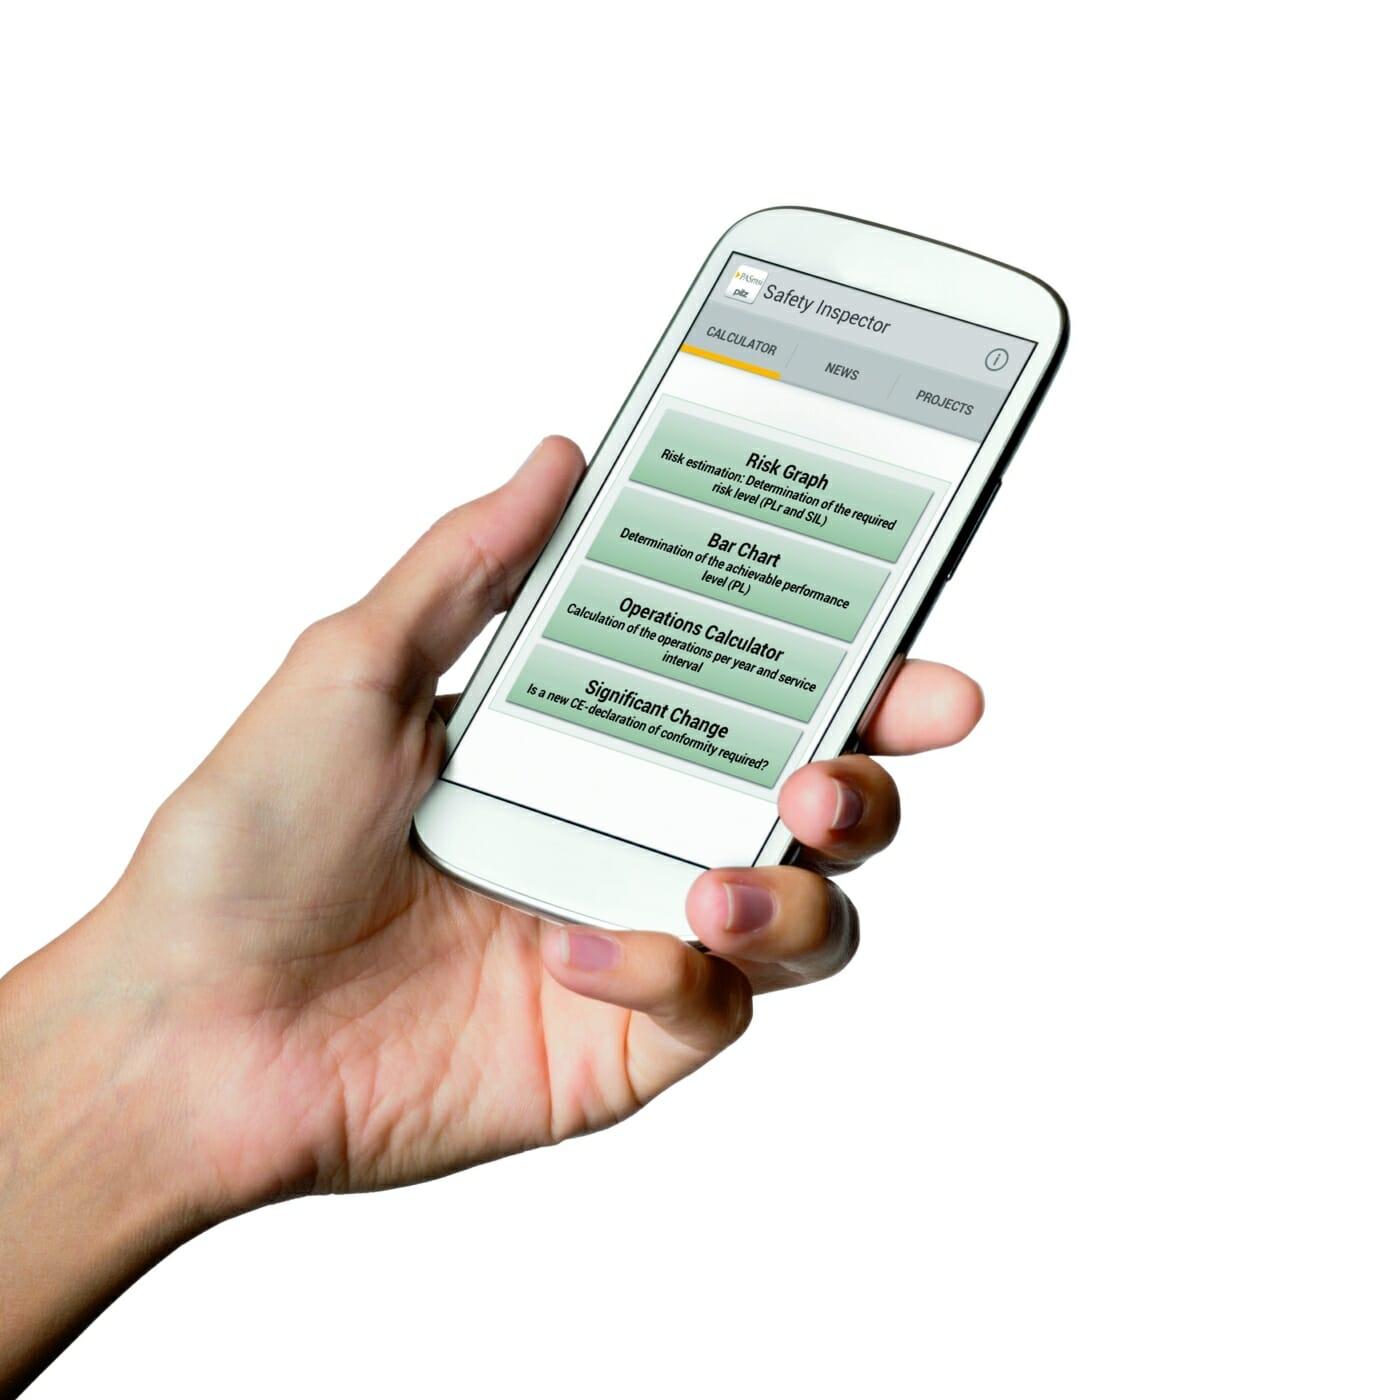 f_hand_holding_smartphone_pasmsi_ist21558554_2013_10